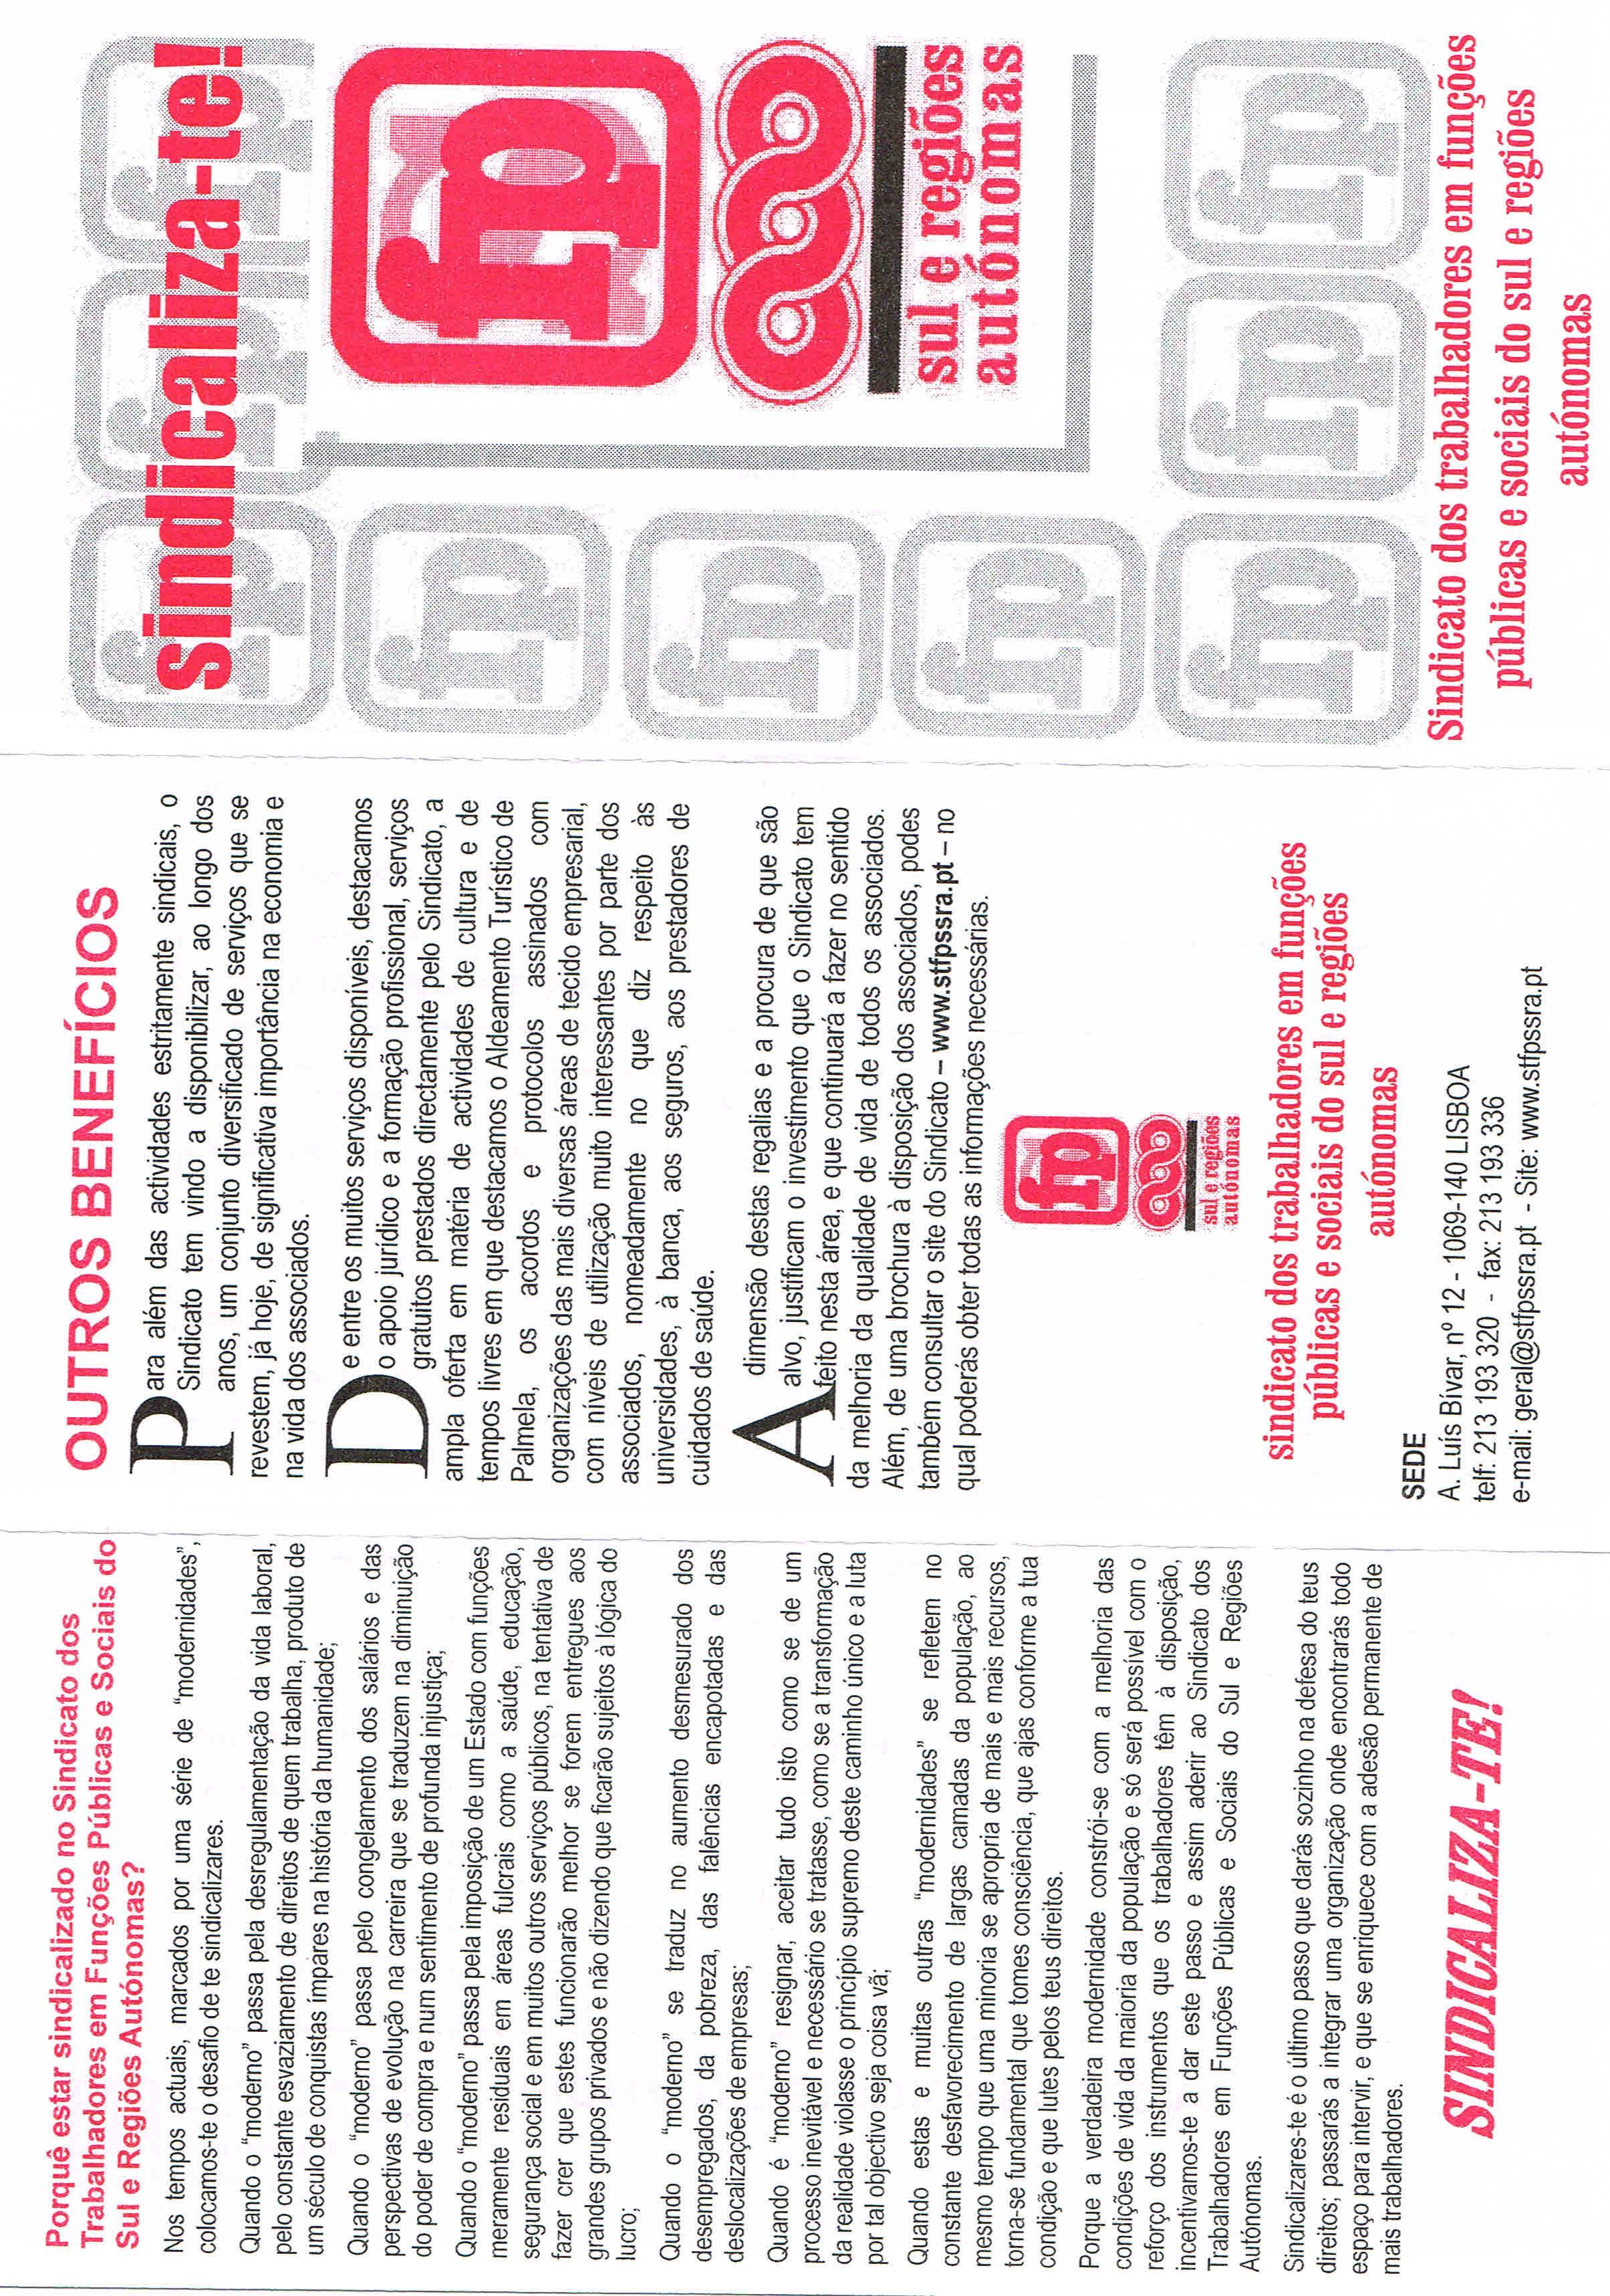 Sindicato dos trabalhadores da funo pblica da zona sul e aores sindicato dos trabalhadores da funo pblica da zona sul e aores 2016 ephemera biblioteca e arquivo de jos pacheco pereira fandeluxe Gallery